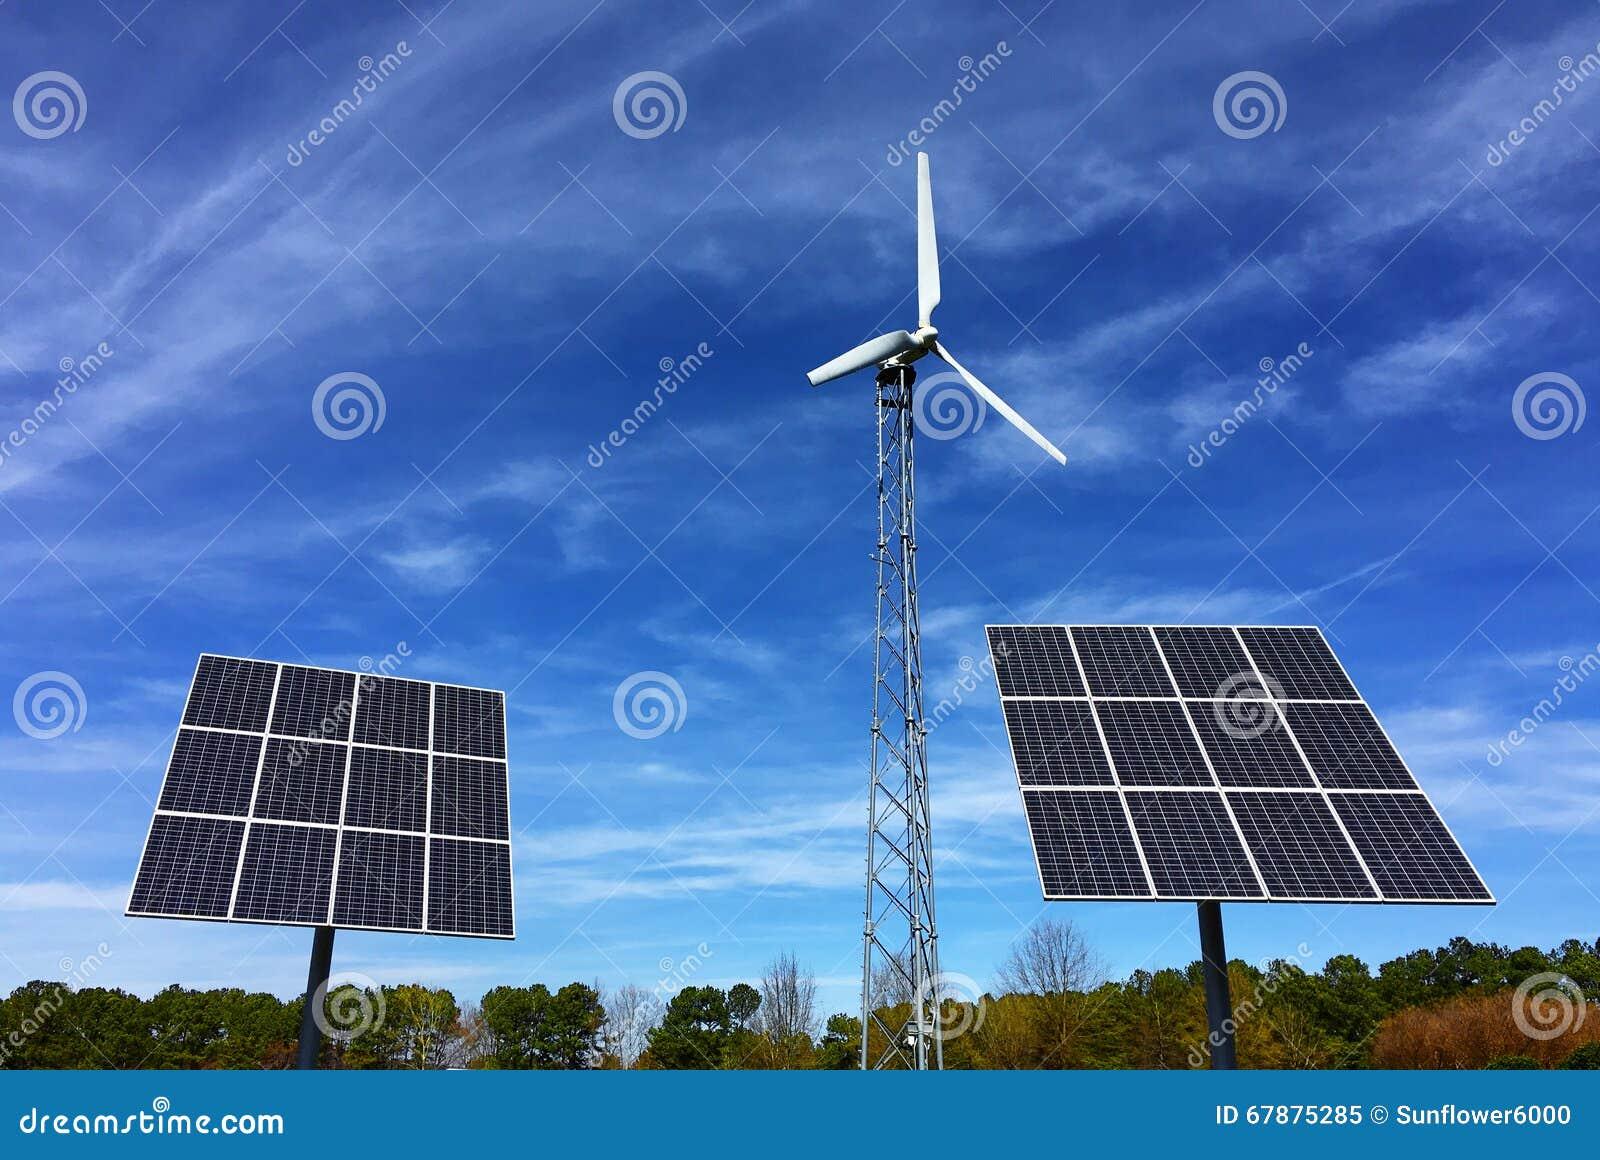 Solar panels and wind energy turbine power station